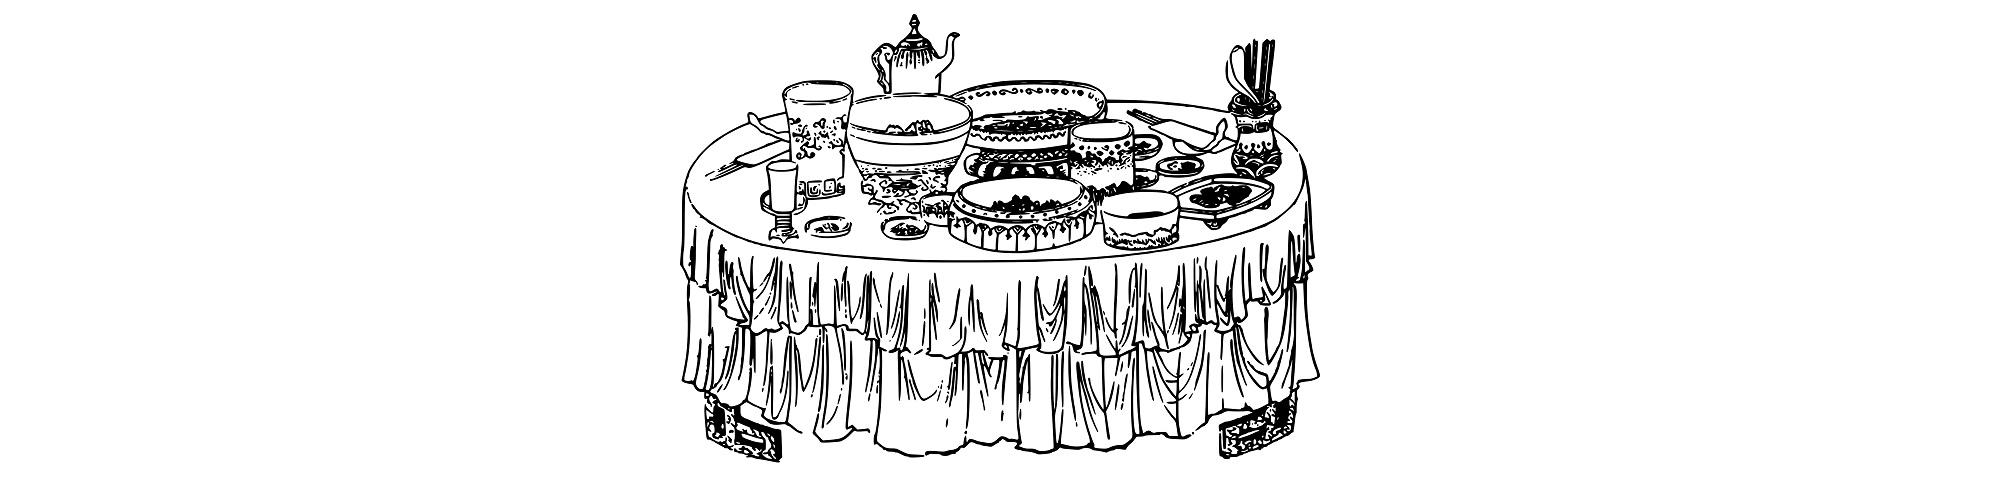 buffet illustration